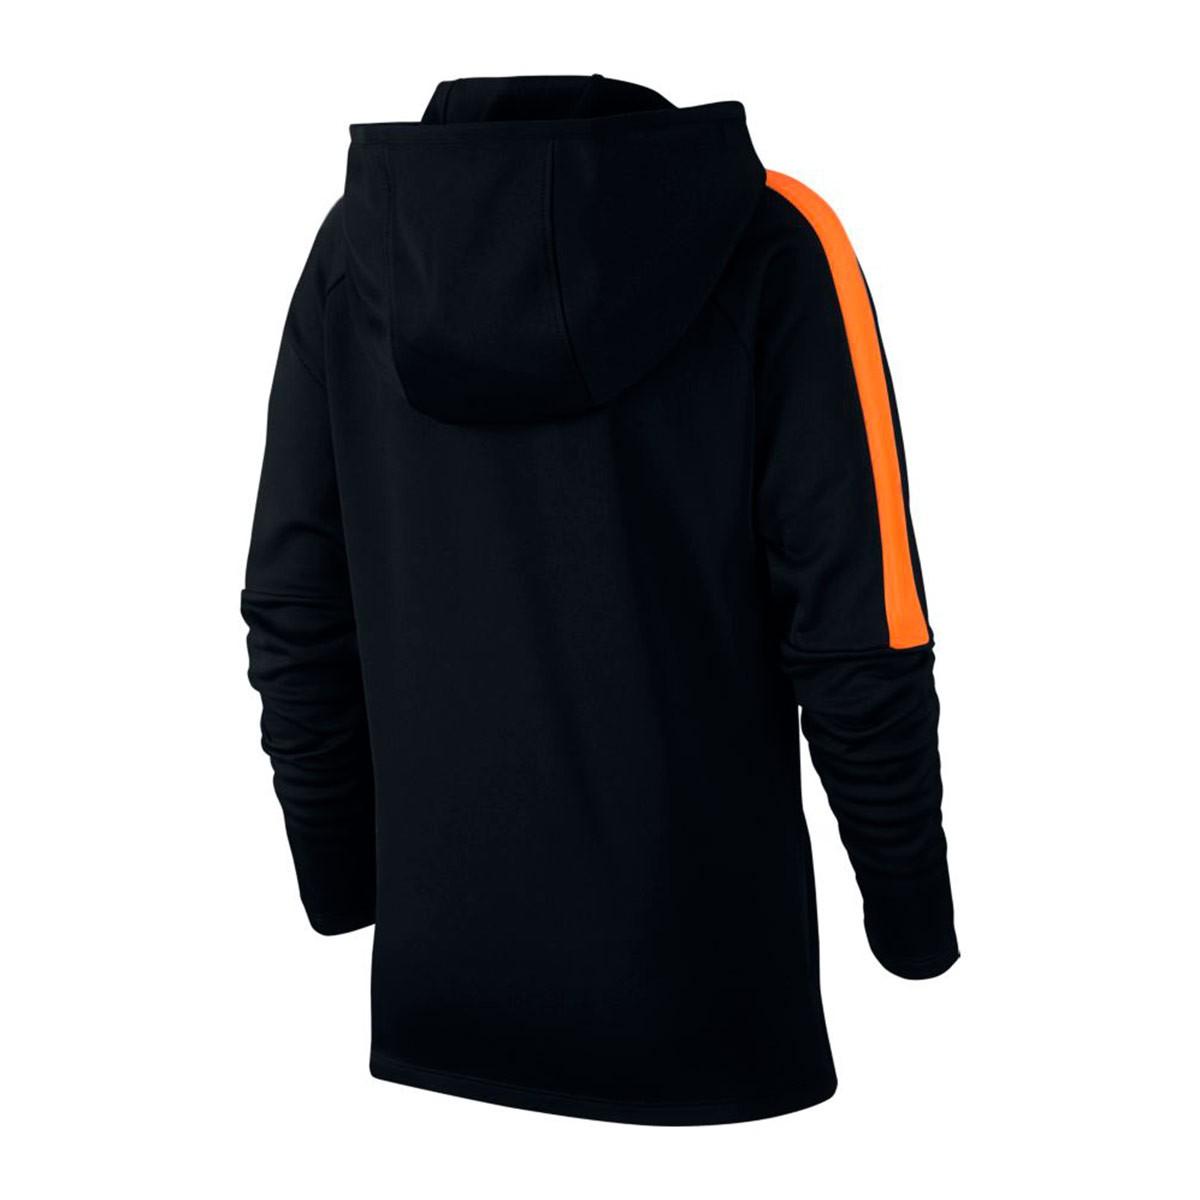 Sudadera Nike Dry Academy Hoodie Niño Black-Cone - Soloporteros es ... 2cecaf7b875a5